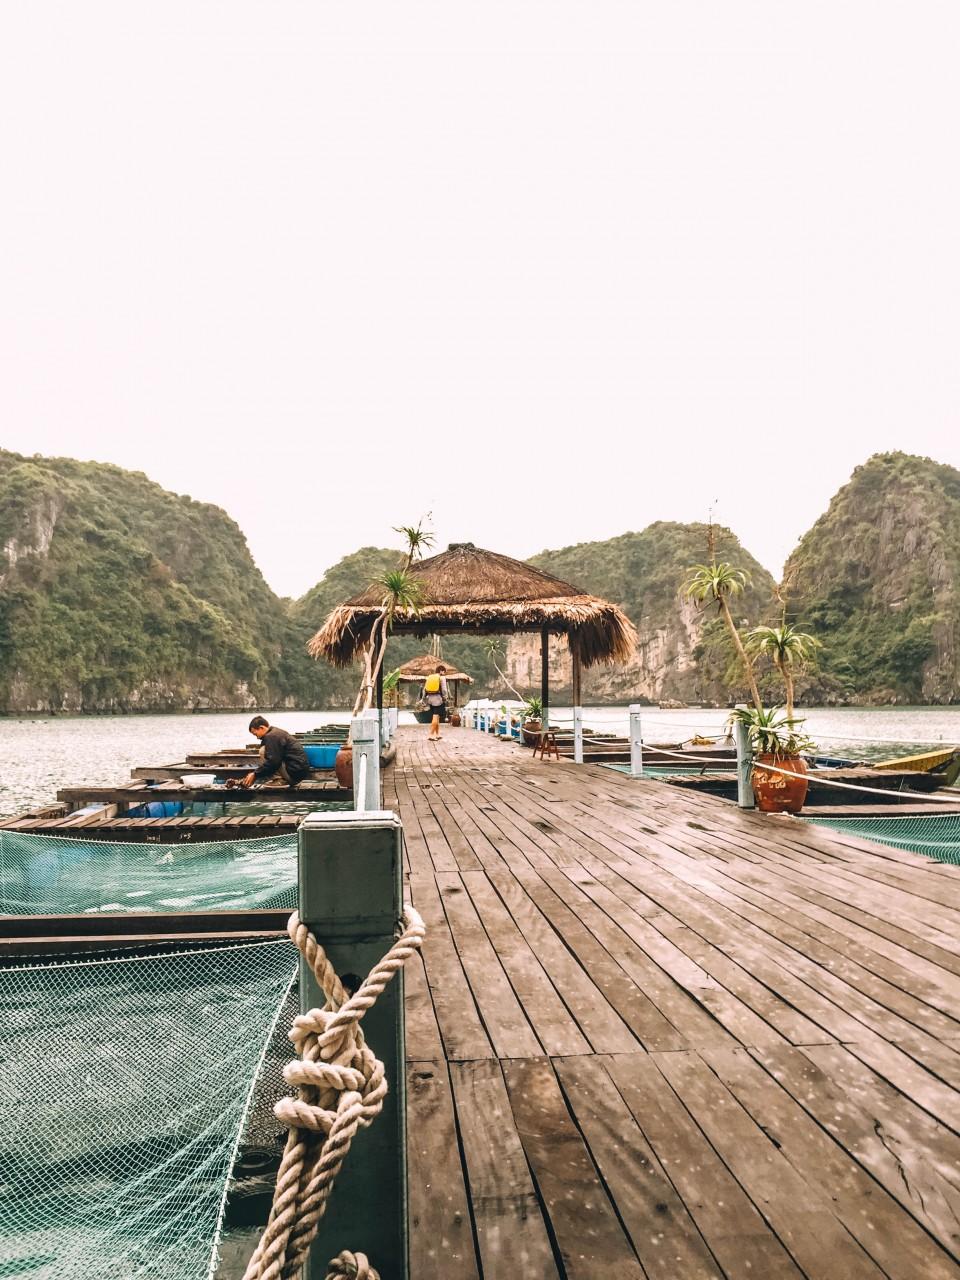 Dock in Vung Vieng fishing village in Halong Bay, Vietnam